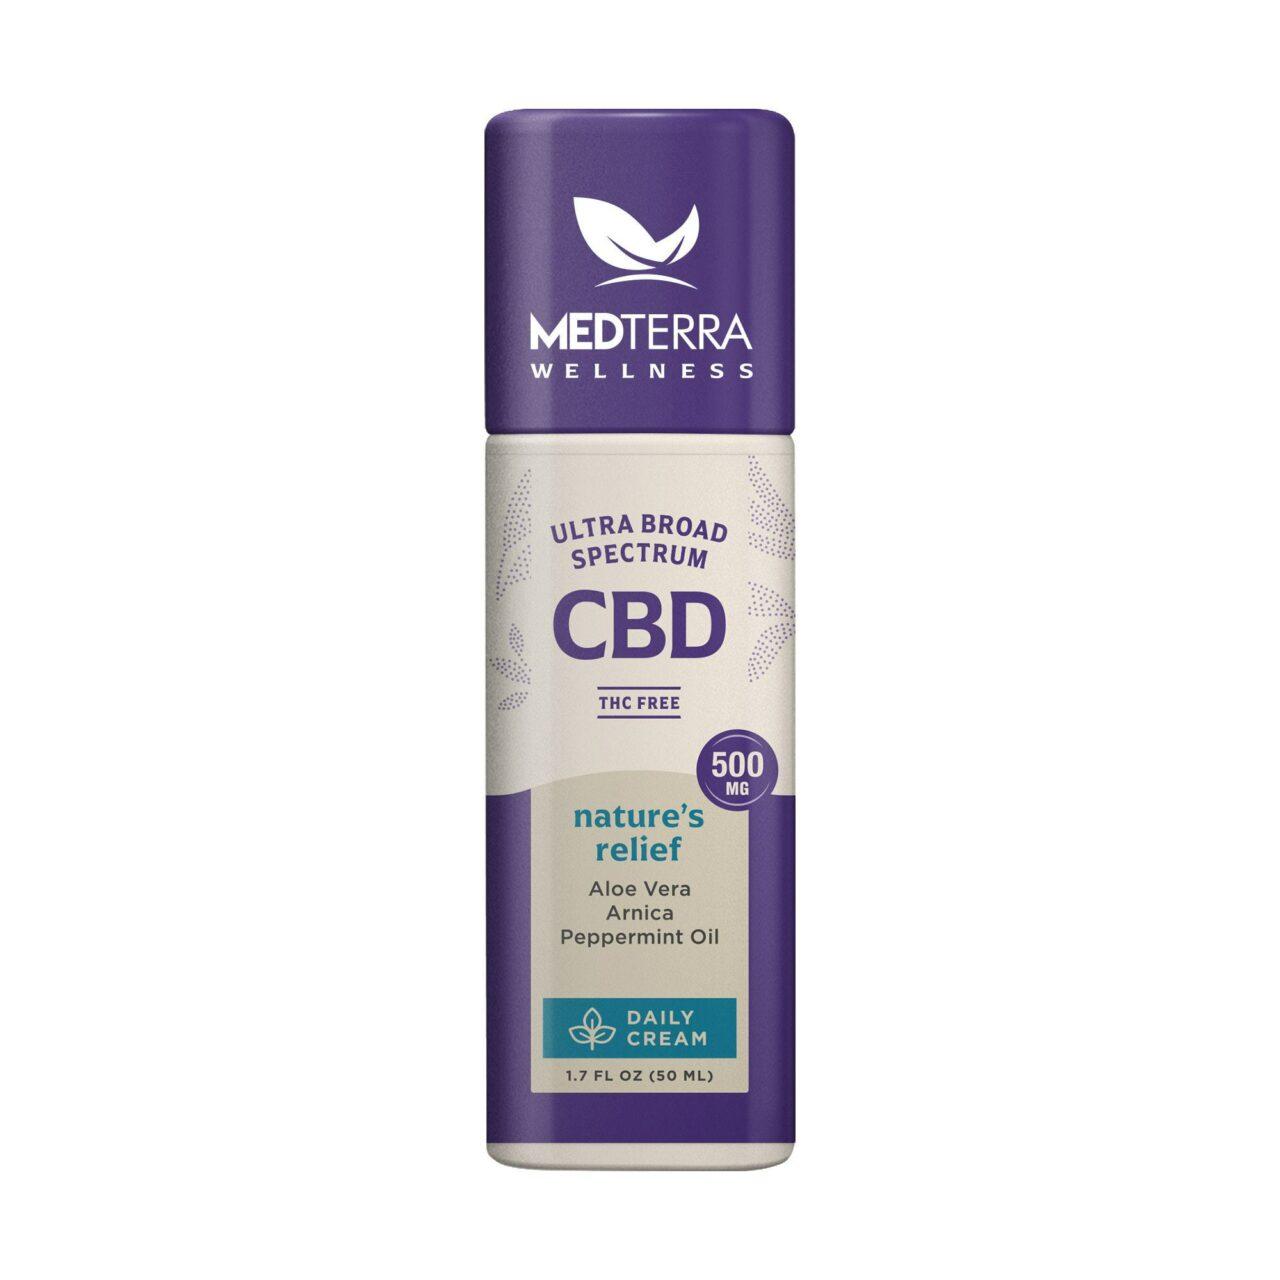 Medterra, Wellness Nature's Relief Daily CBD Cream, Broad Spectrum THC-Free, 1.7oz, 500mg CBD 1